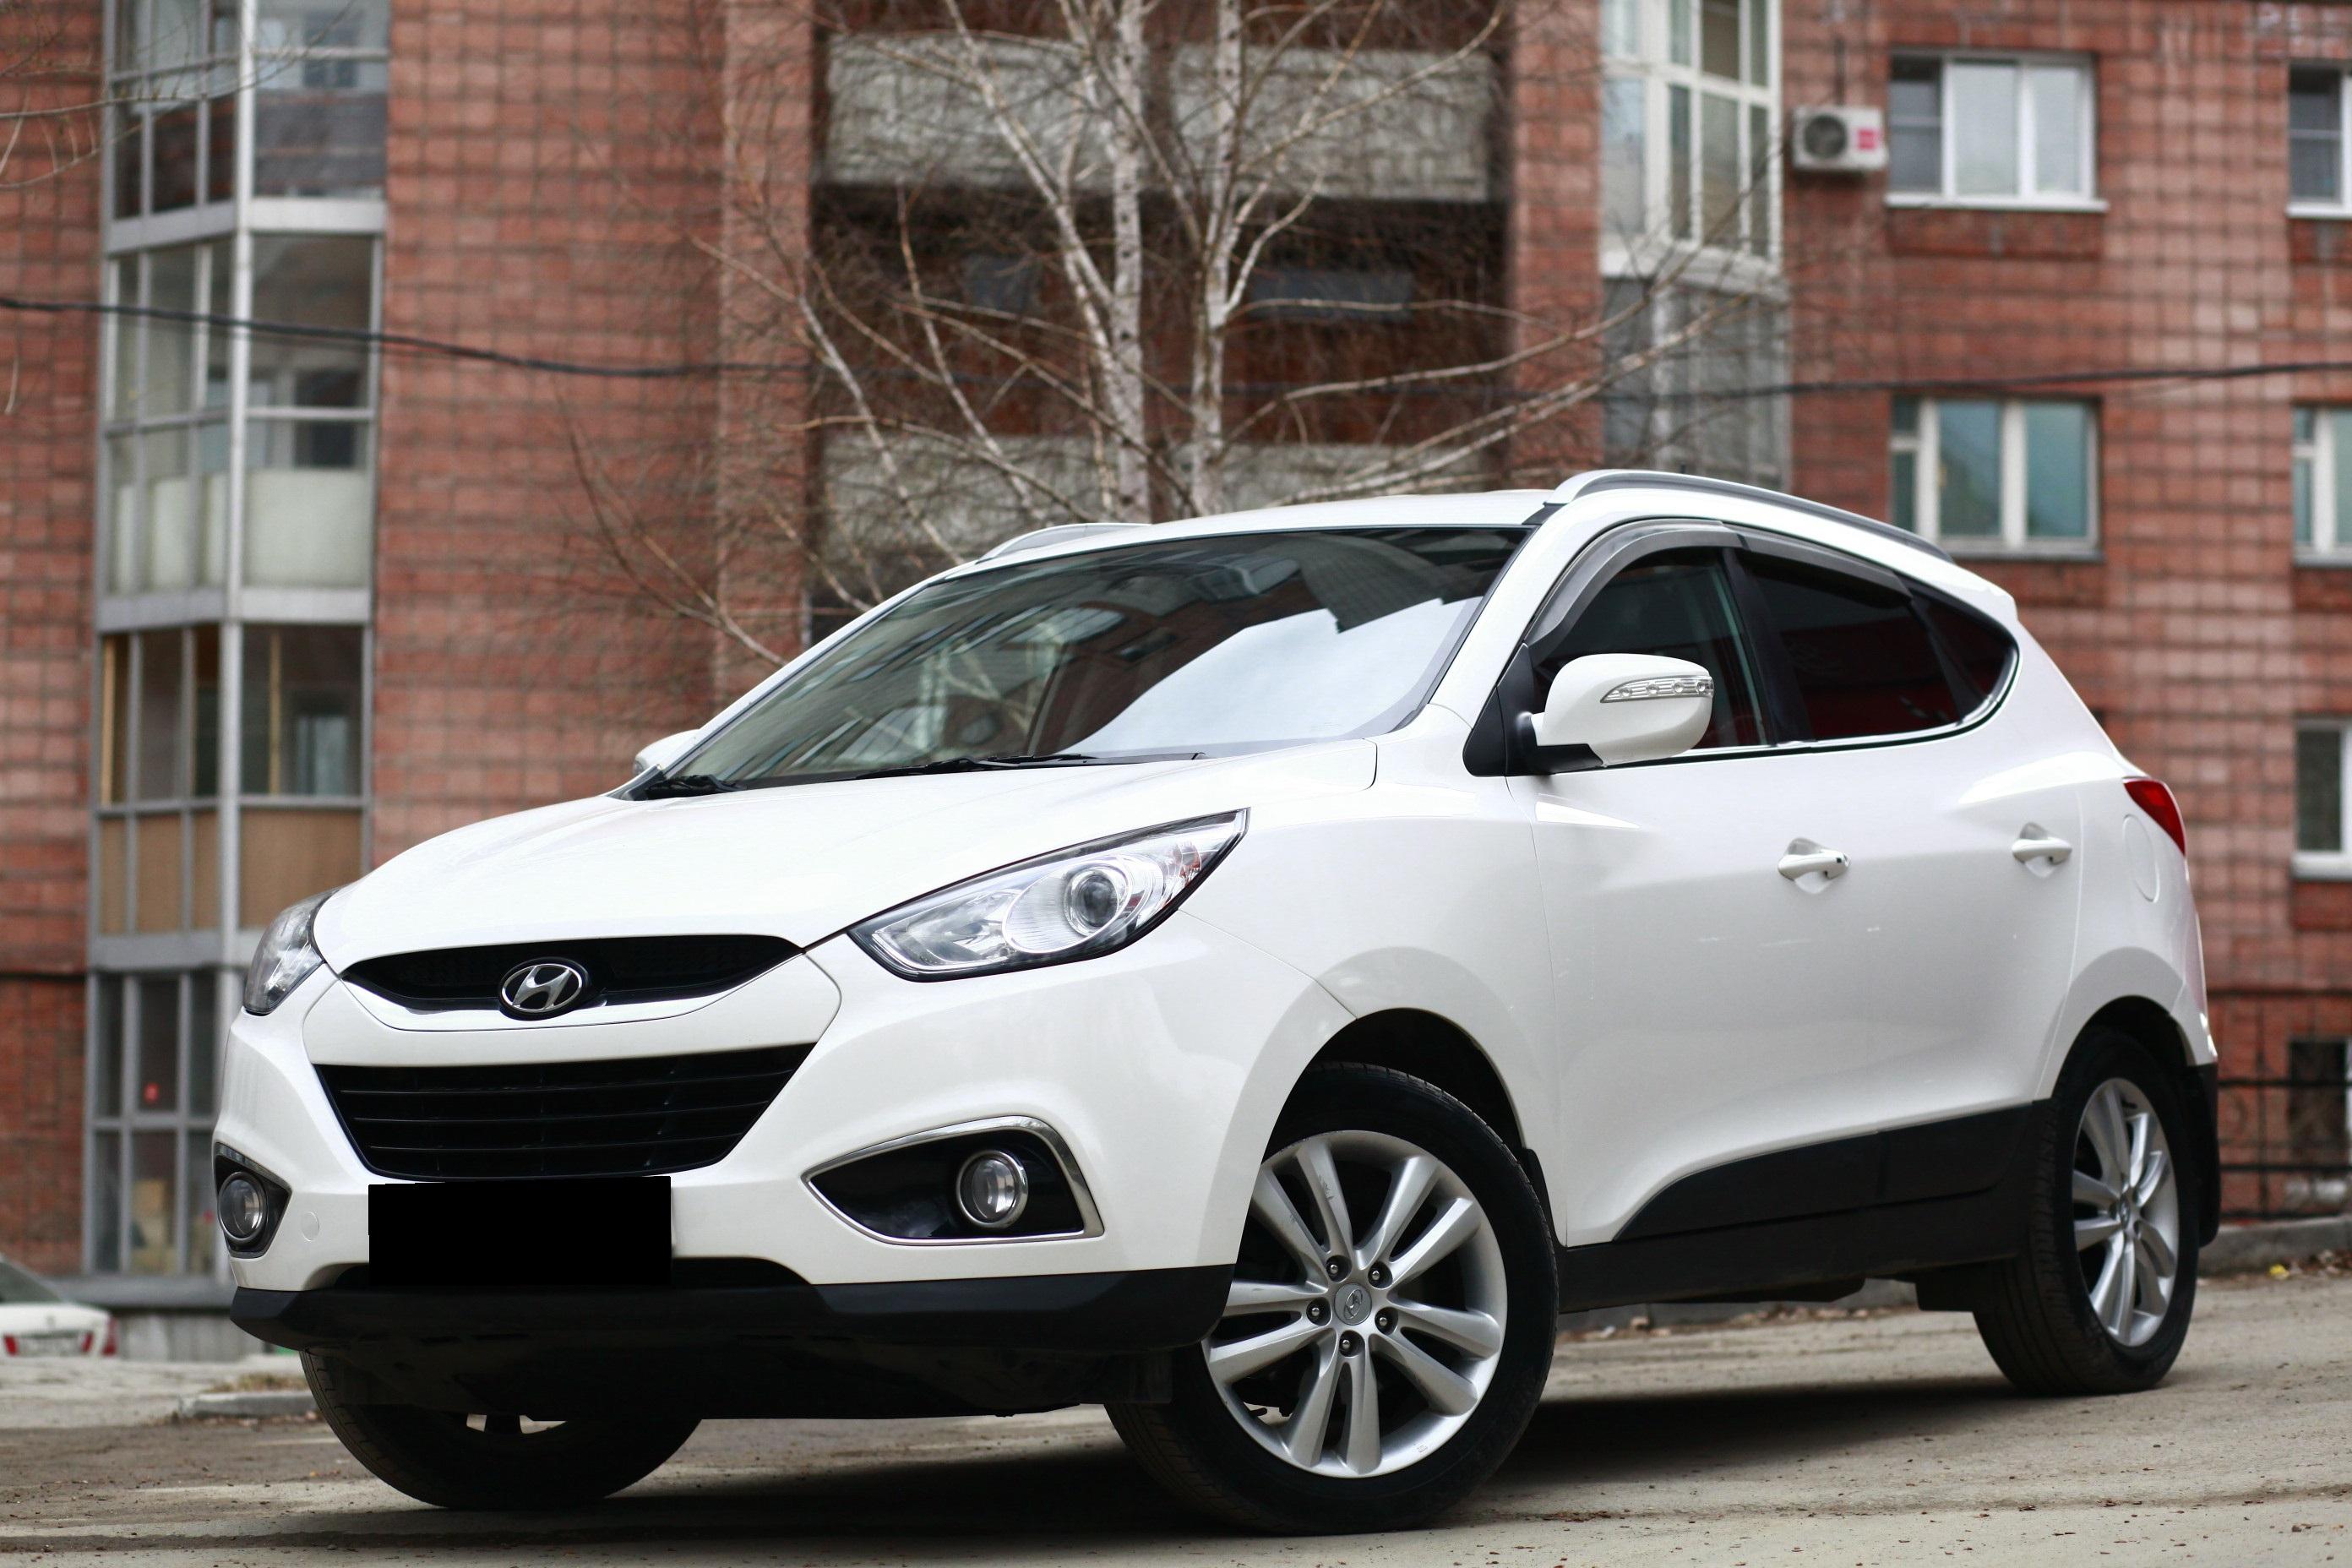 Hyundai ix35 850 000 руб